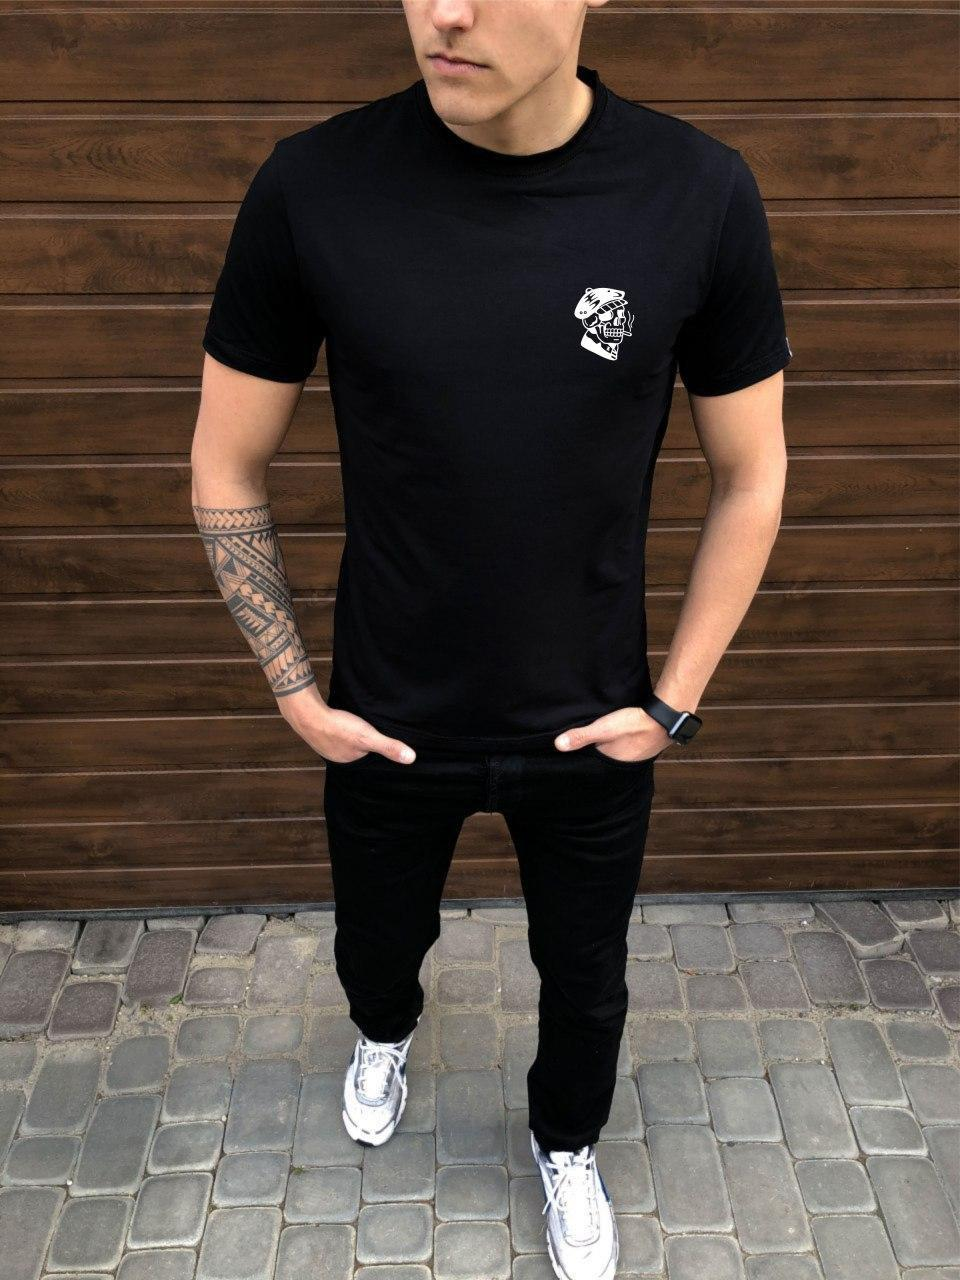 Мужская футболка Peremoga -Cherep s segaretoy Pobedov (черная)